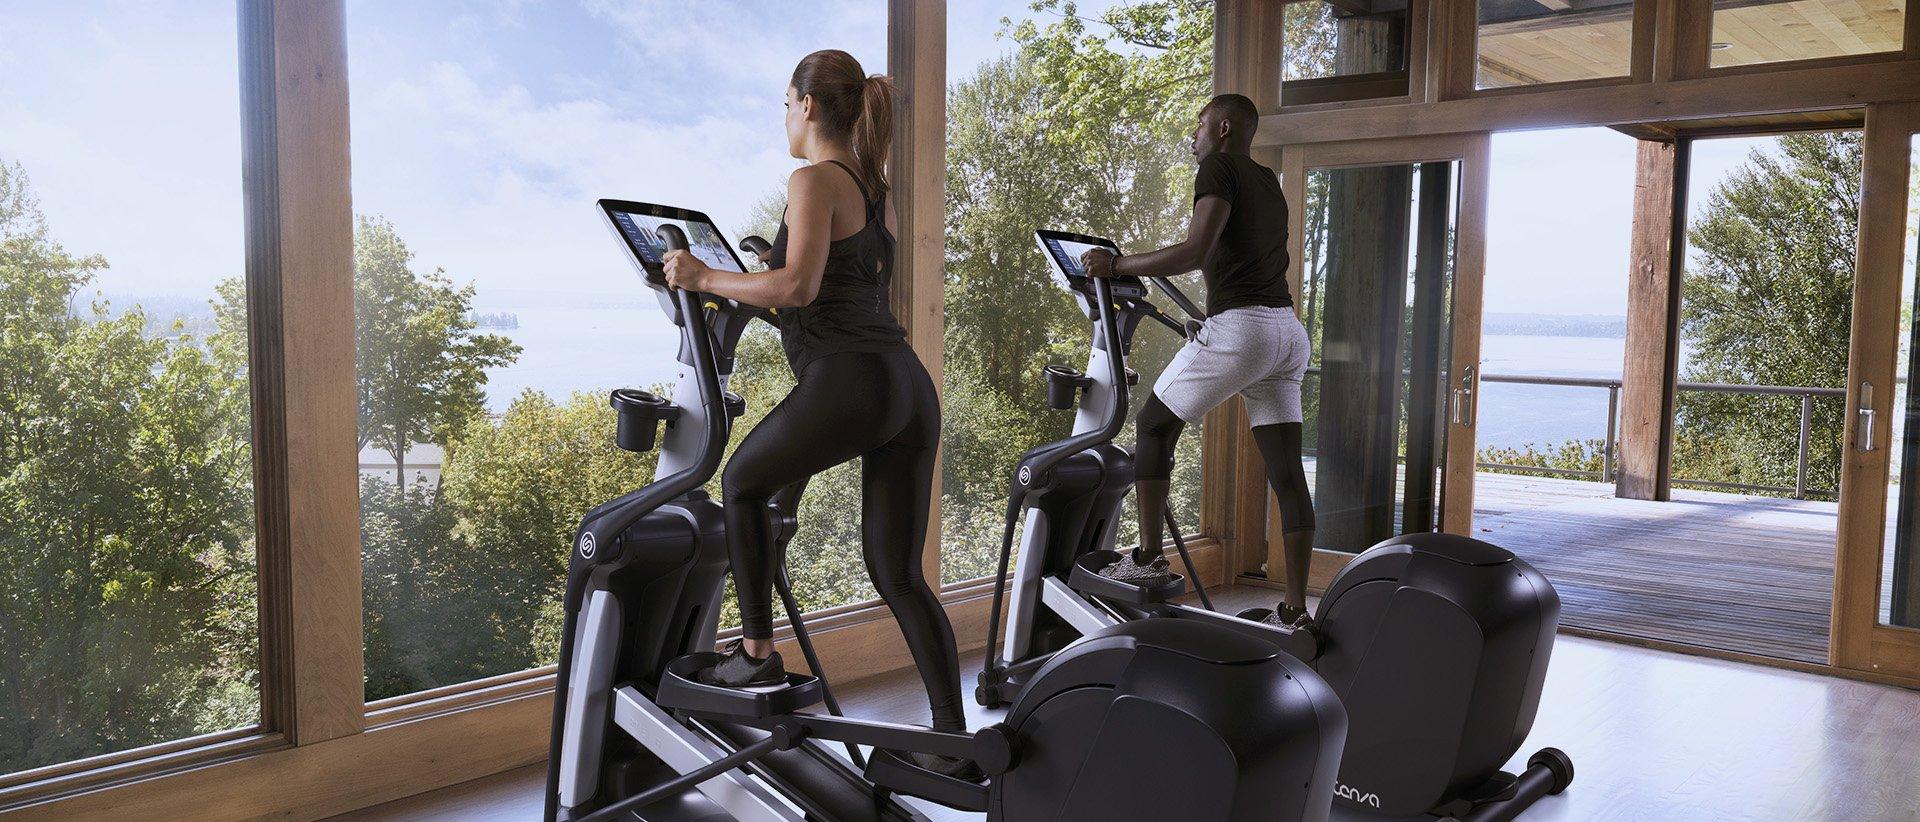 eliptyk intenza fitness